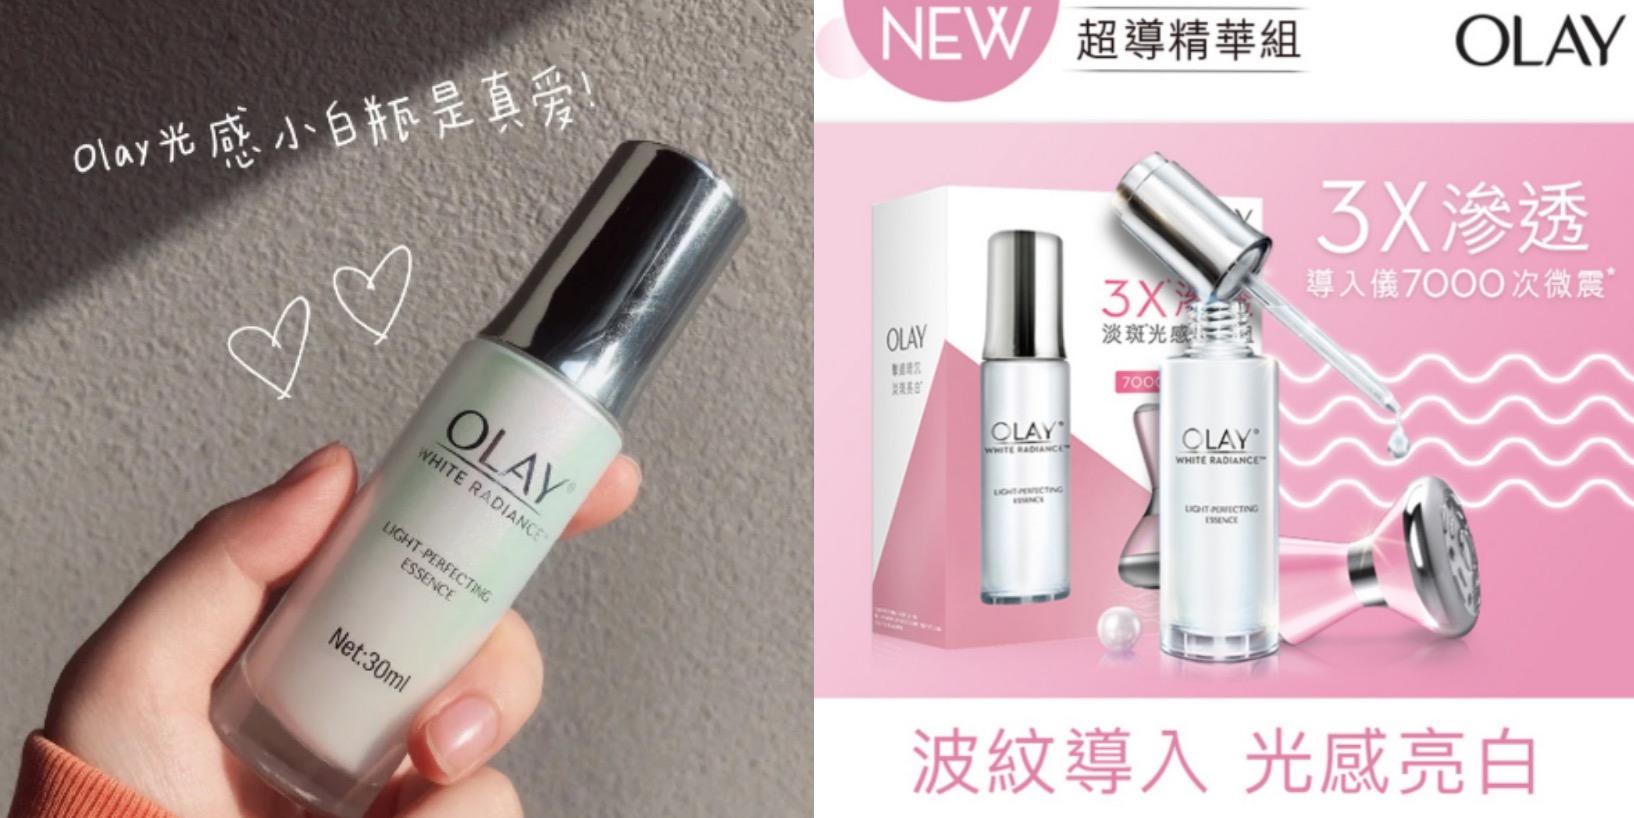 OLAY淡斑光感小白瓶採用珍珠光學科技,添加高純超級成份煙醯胺(B3),以及美白複合精華複合精華,能從根源阻黑淨白,全面提升淨白度。